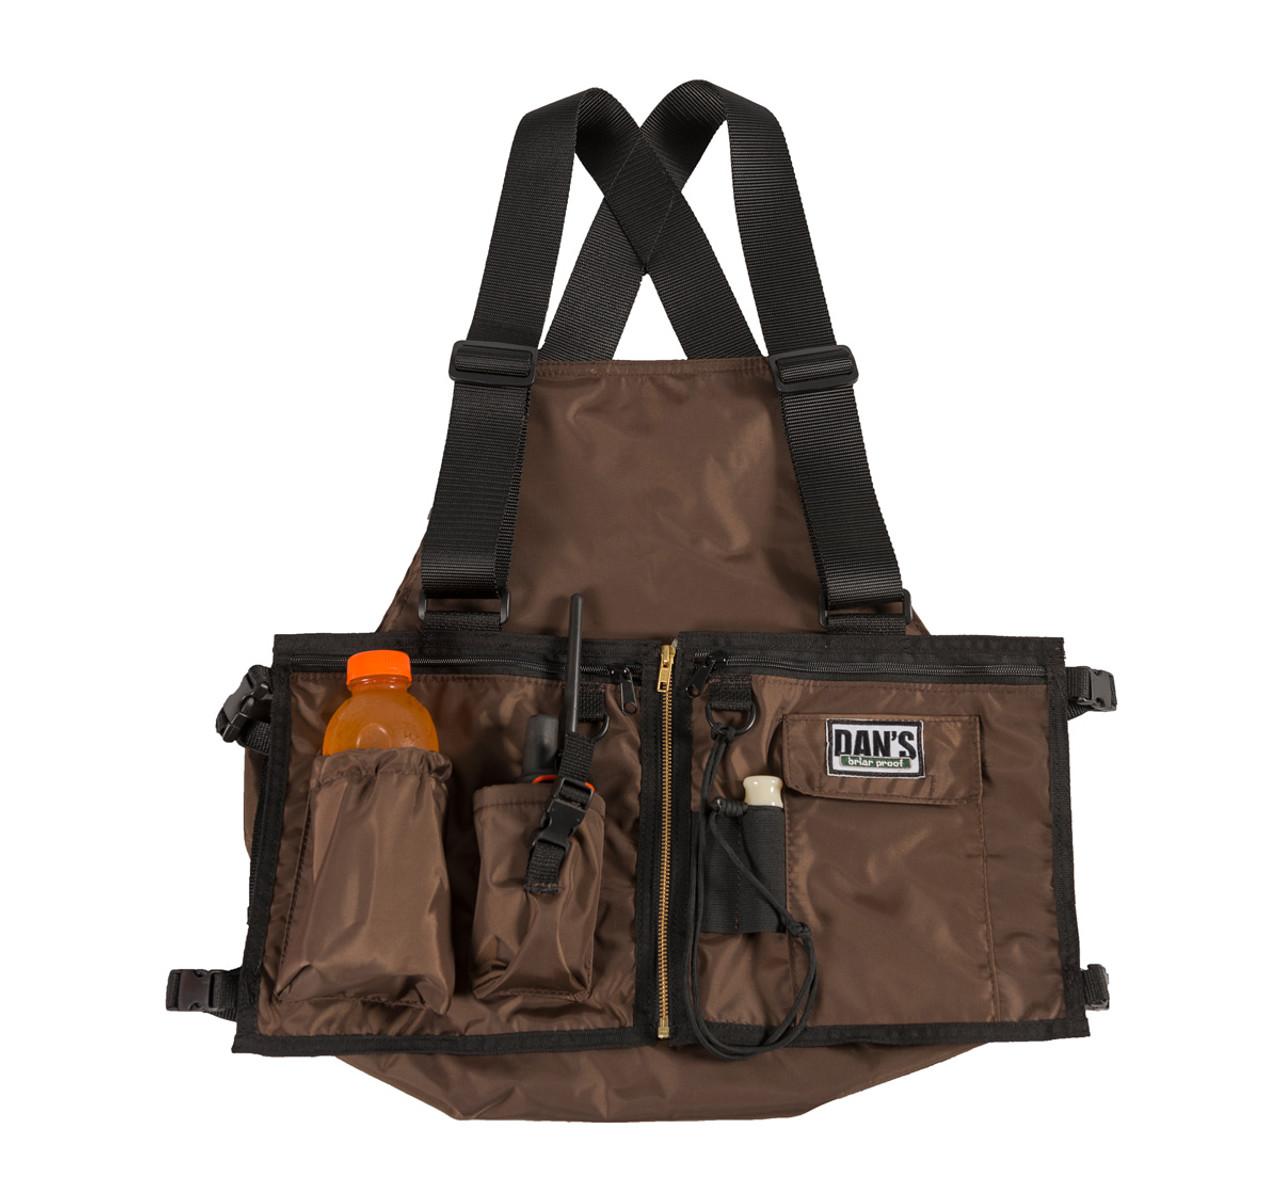 Dans Hunting Gear Ultimate Strap Vest (Brown)